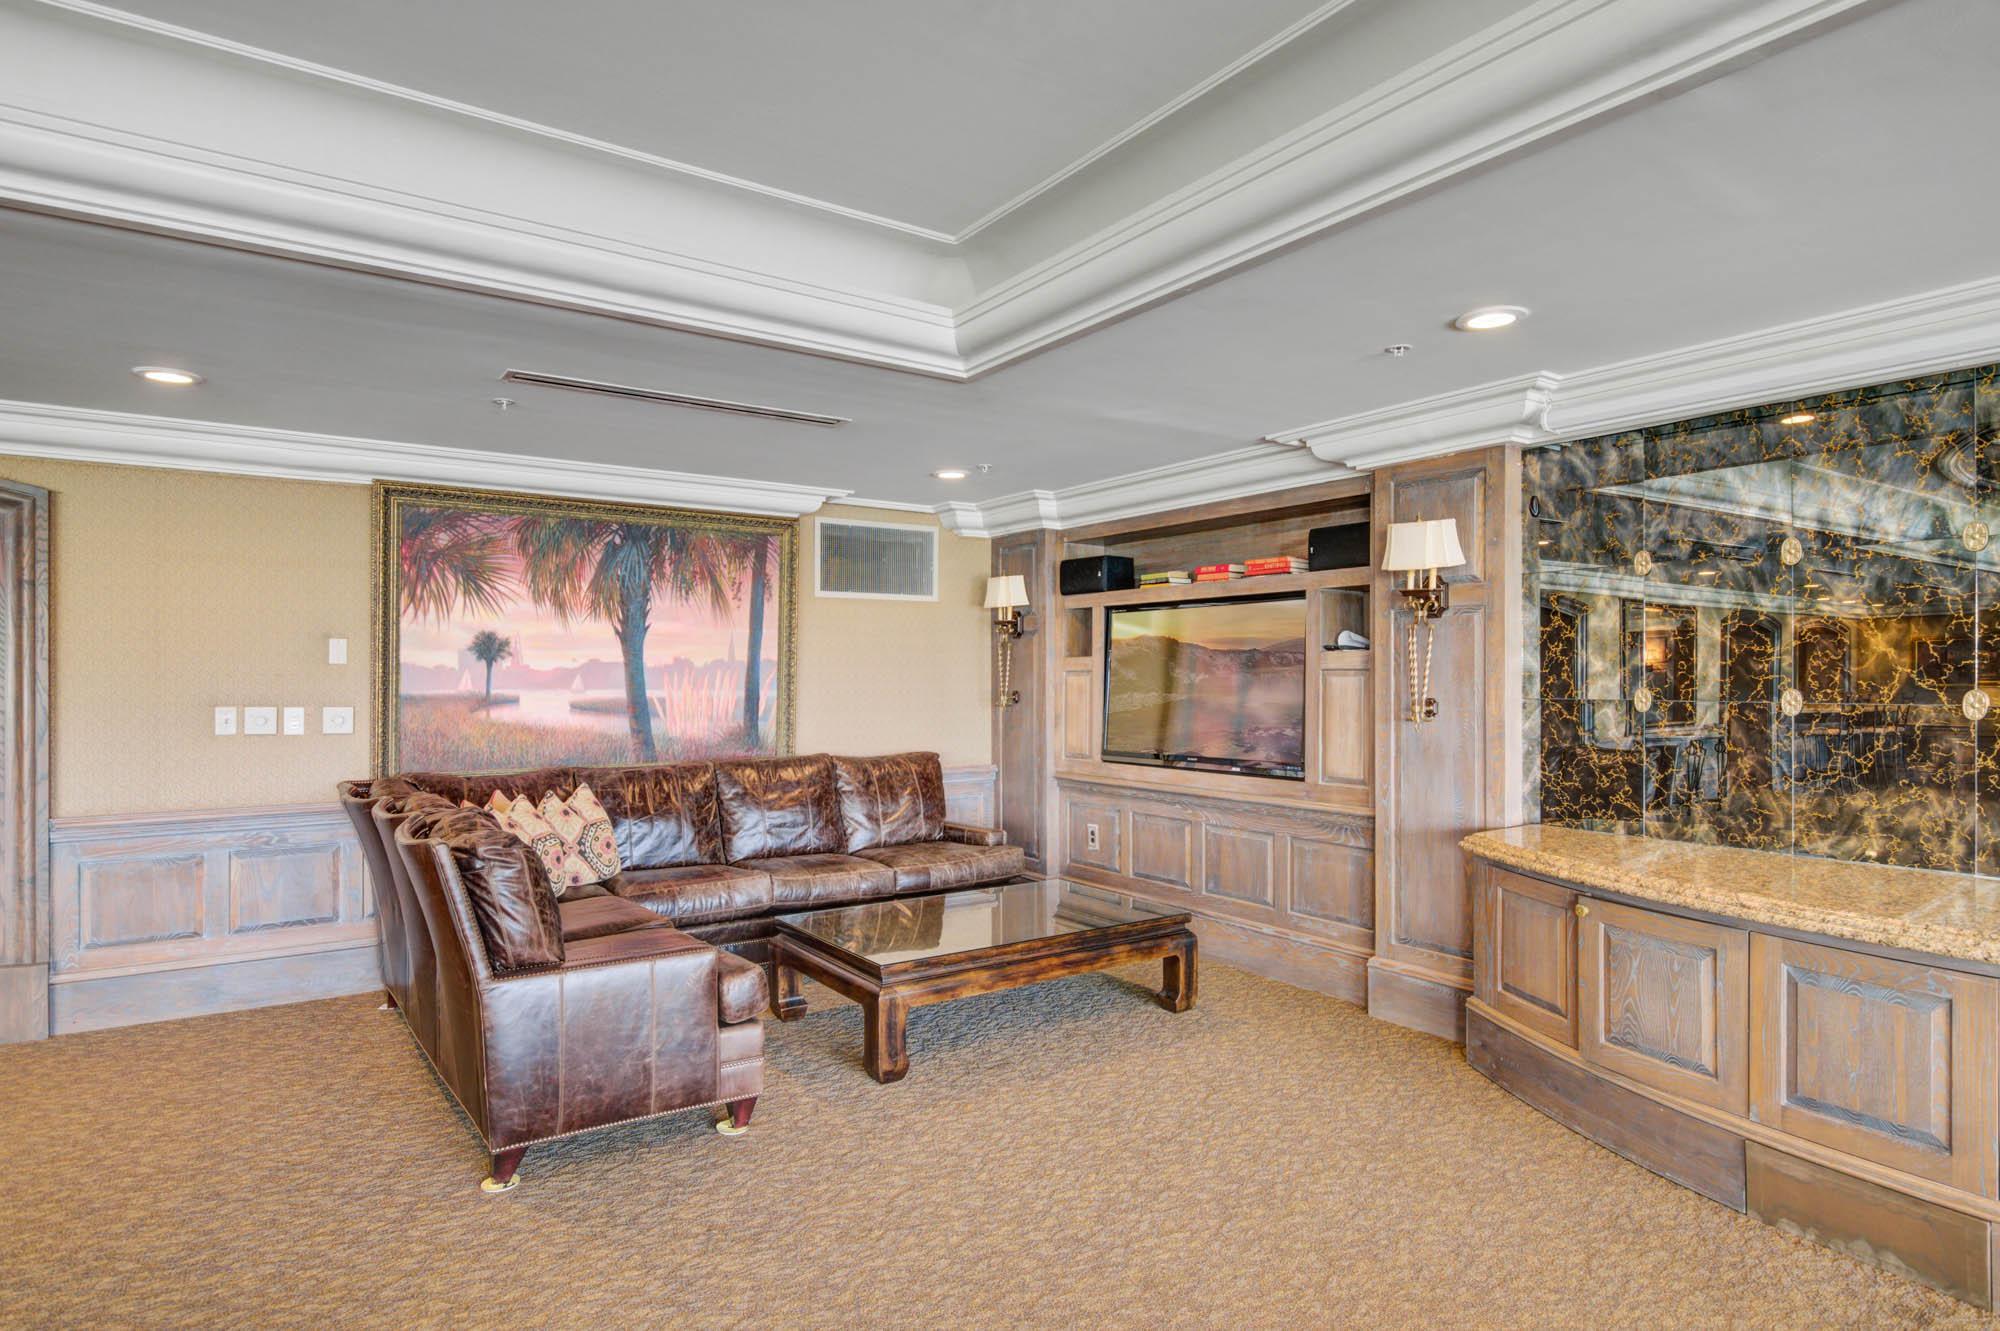 Renaissance On Chas Harbor Homes For Sale - 231 Plaza, Mount Pleasant, SC - 6